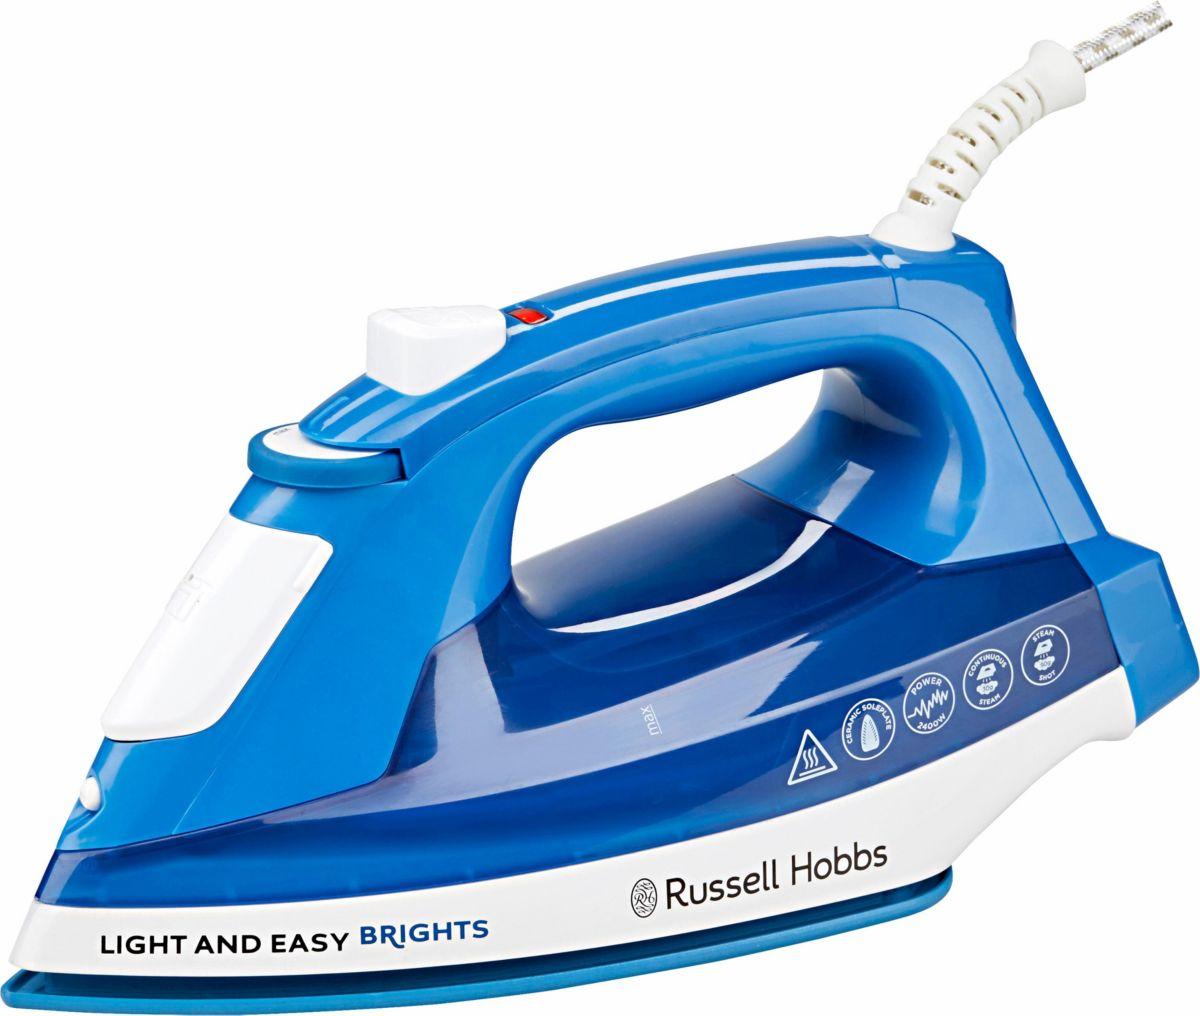 Russell Hobbs Dampfbügeleisen Light&Easy Brights 24840-56, Keramik-Bügelsohle, 2400 Watt, Aqua